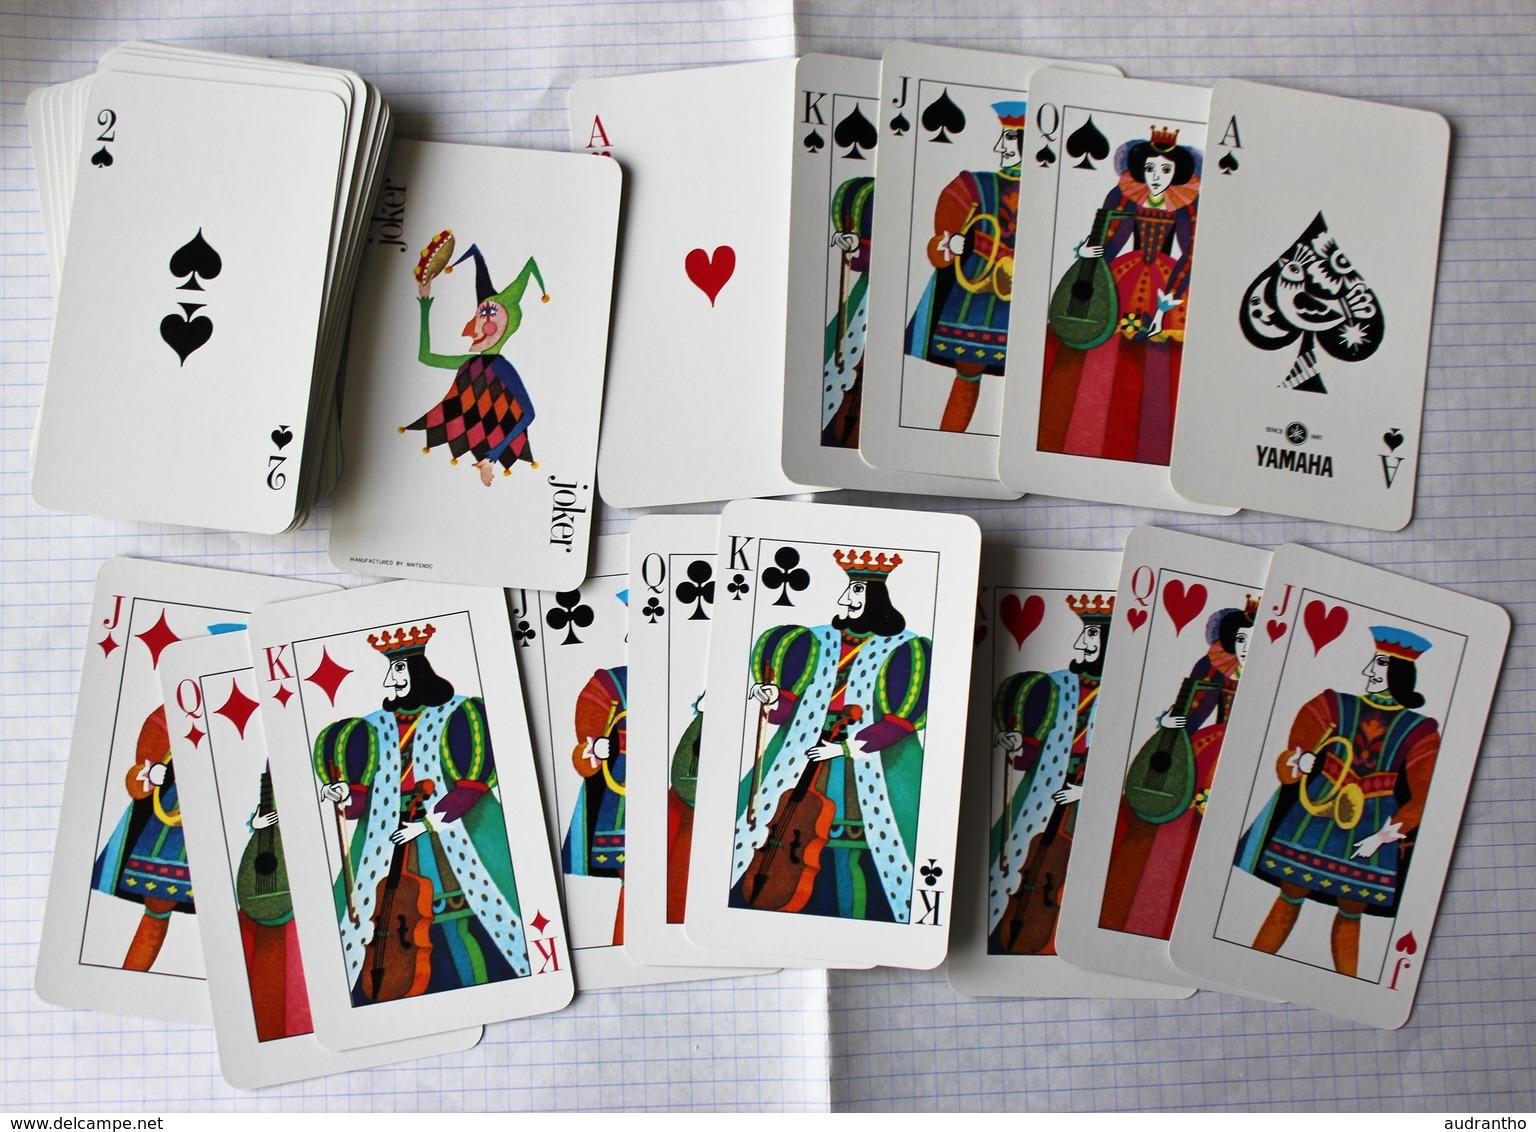 Rare Beau Jeu 54 Cartes à Jouer Yamaha Instruments De Musique Manufactured By Nintendo Playing Cards - 54 Cartes